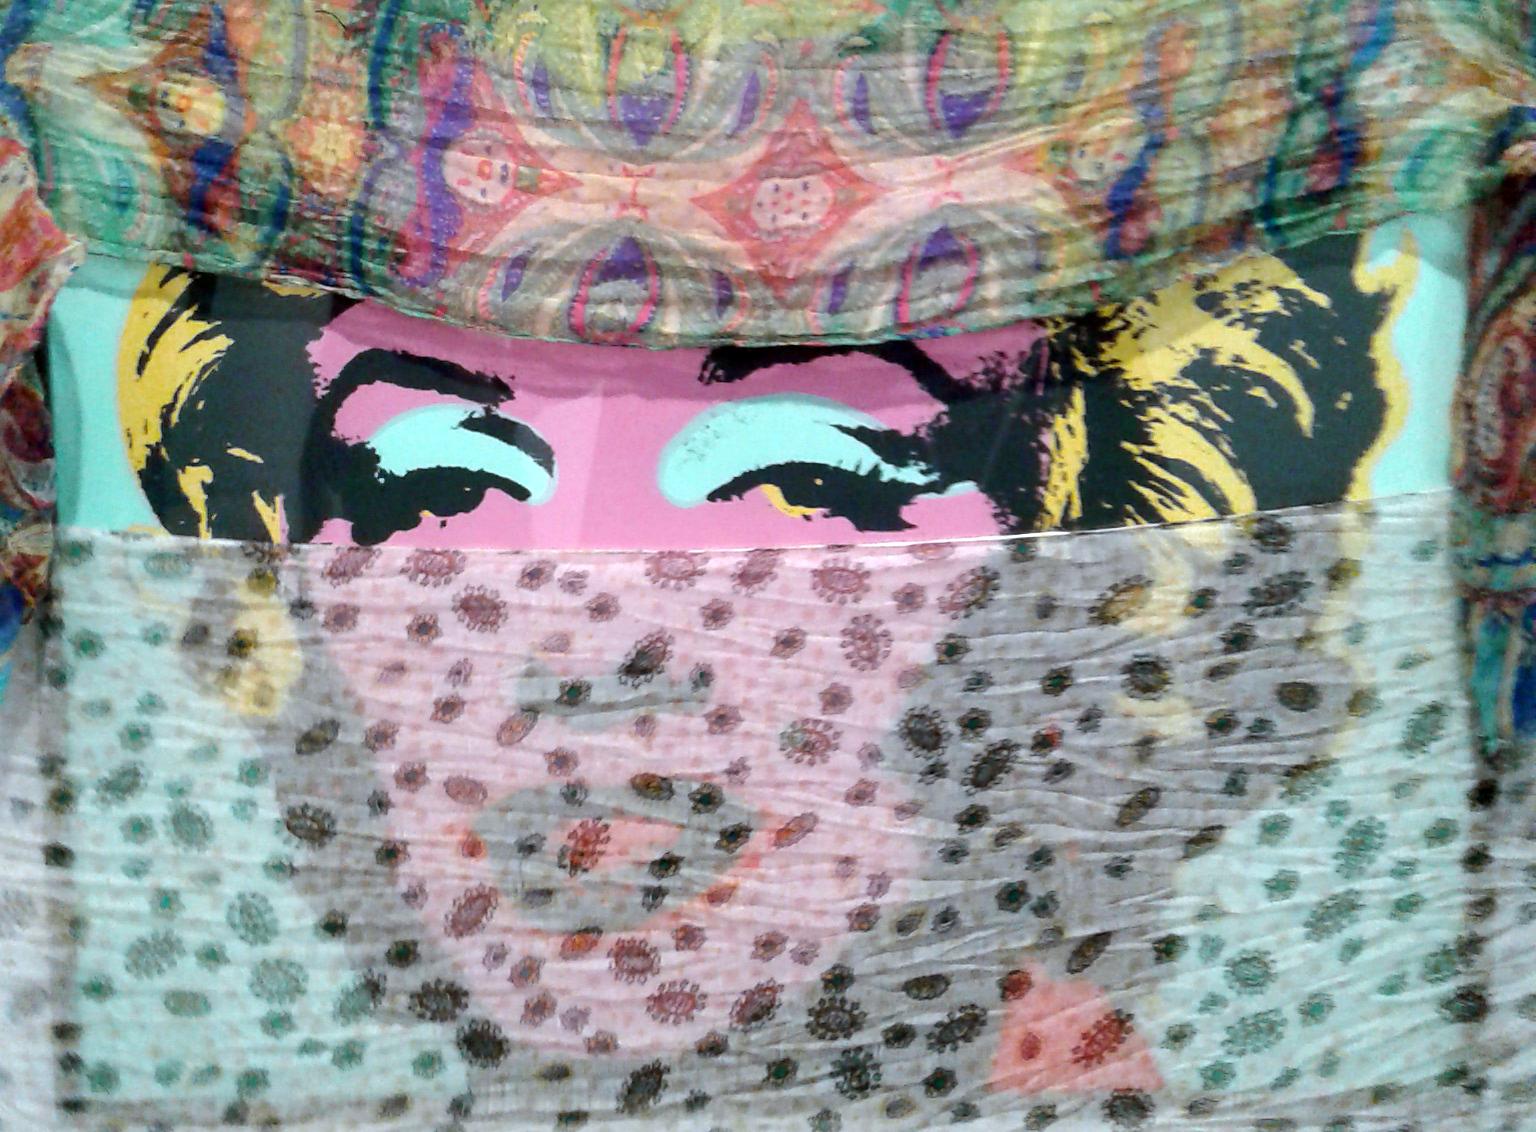 Sin Autor. 2016. Warhol 4.